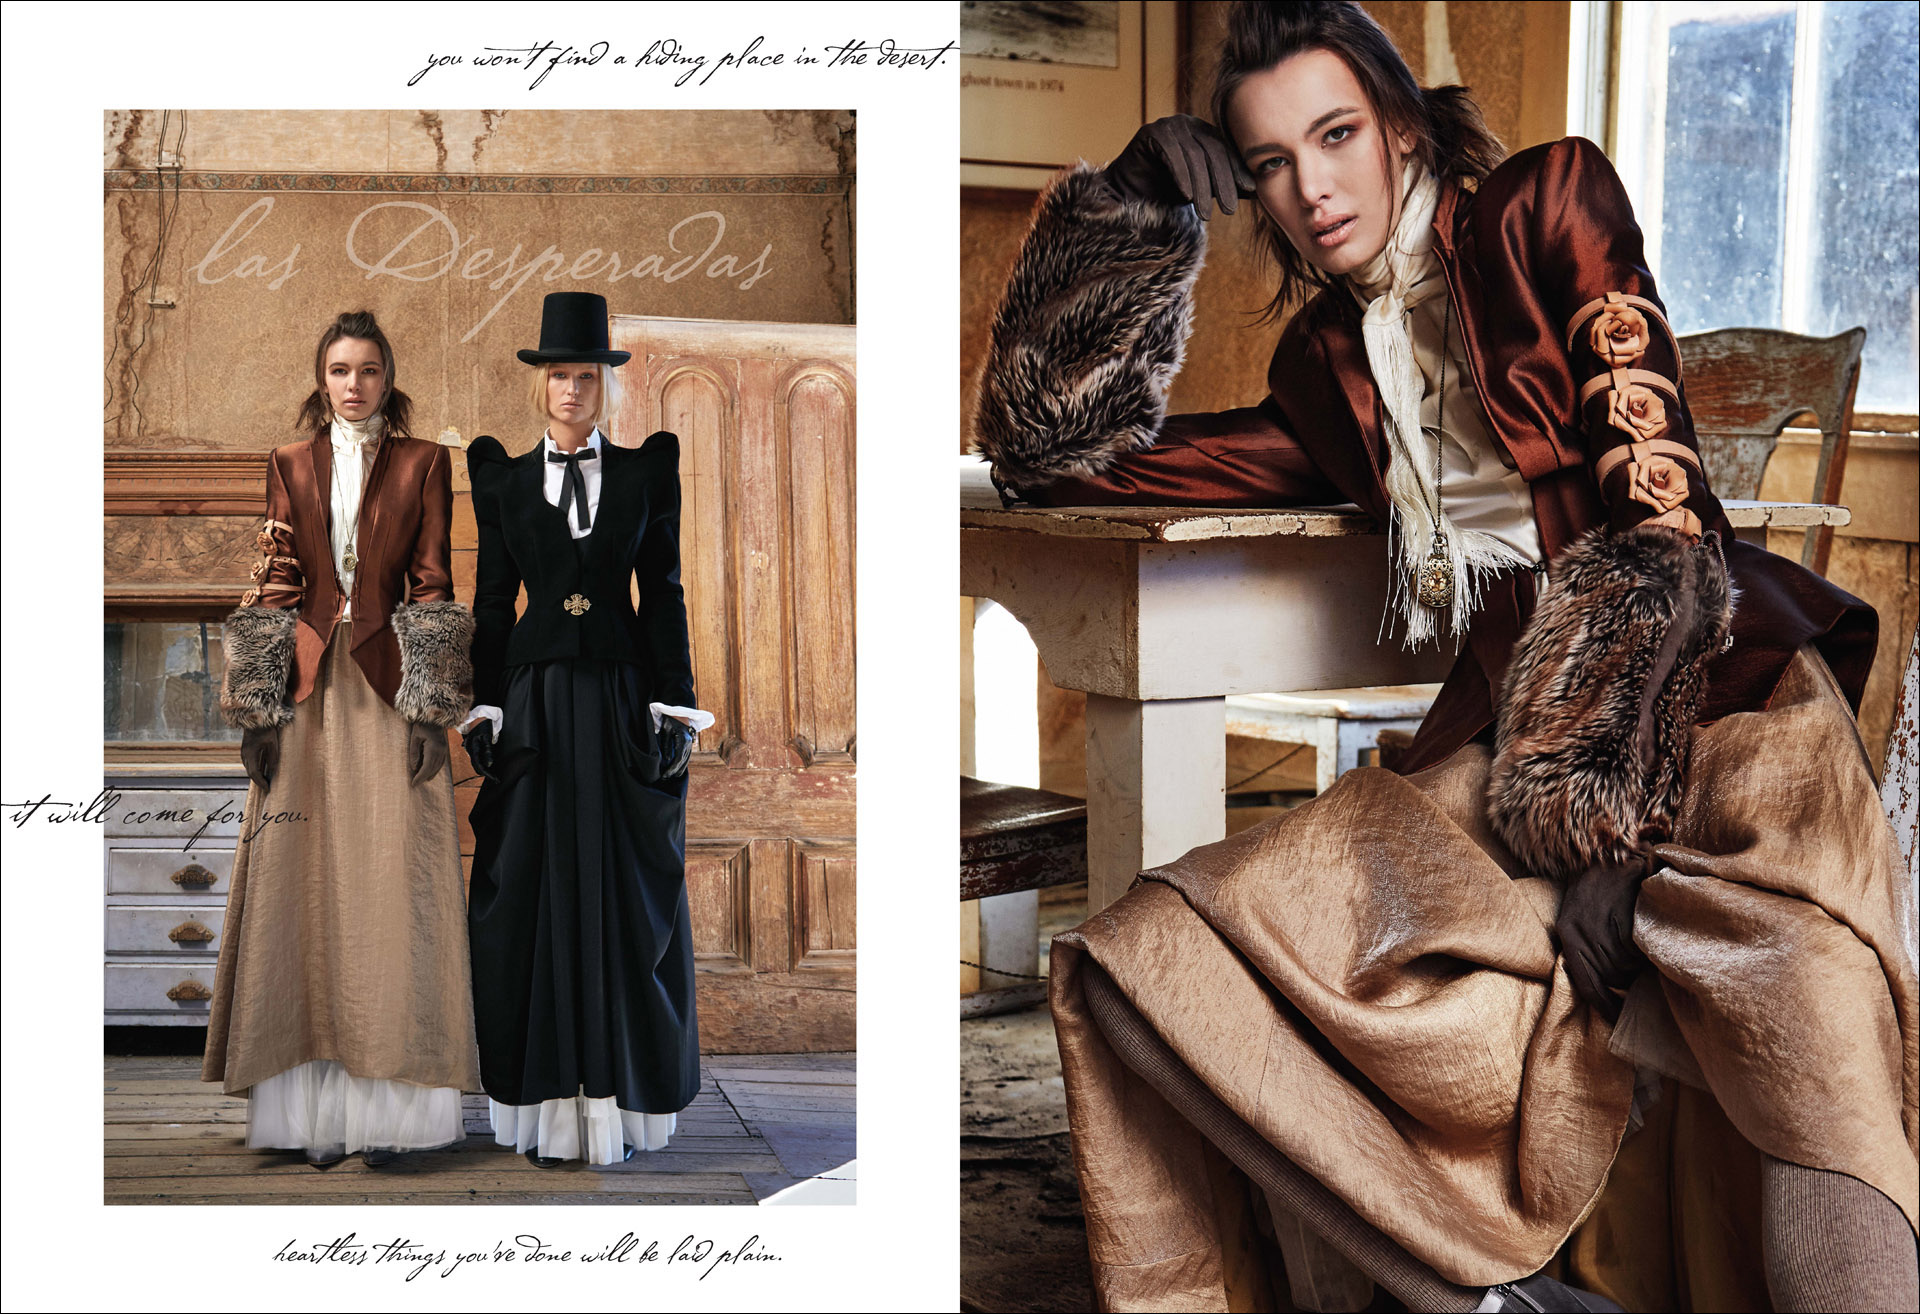 Spirit-&-Flesh-Magazine_LAS-DESPERADAS_by_MEG-WEBSTER_and_ATHANASIA-NICHOLS_001